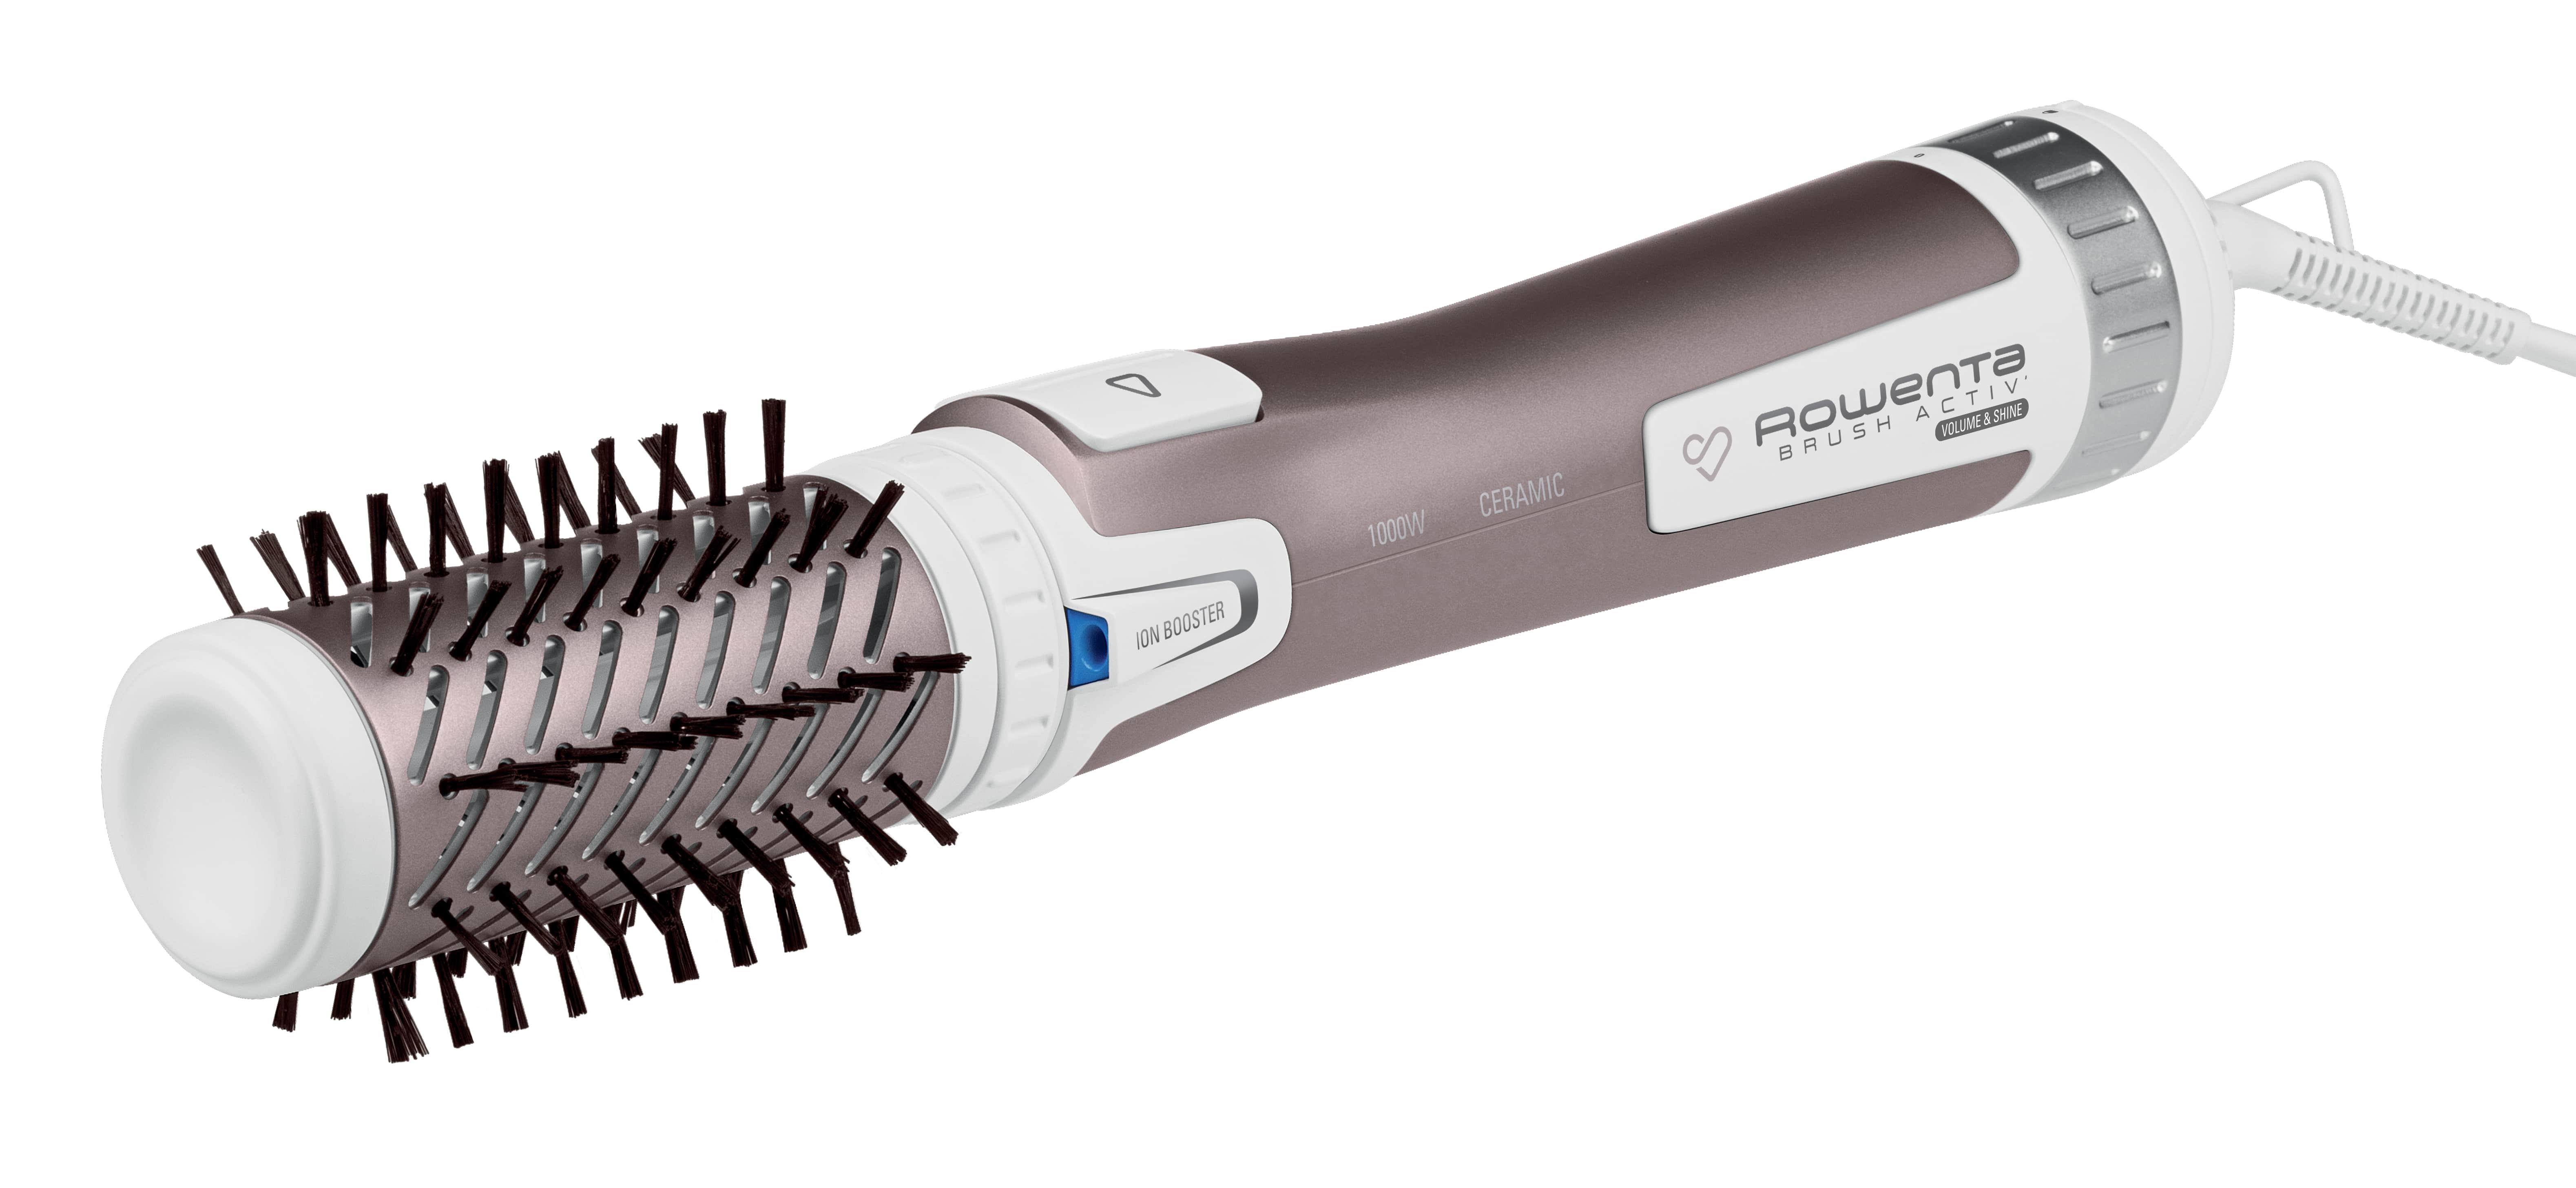 Brush Activ Rowenta Premium Care min - Rowenta Premium Care: capelli come dal parrucchiere senza danni